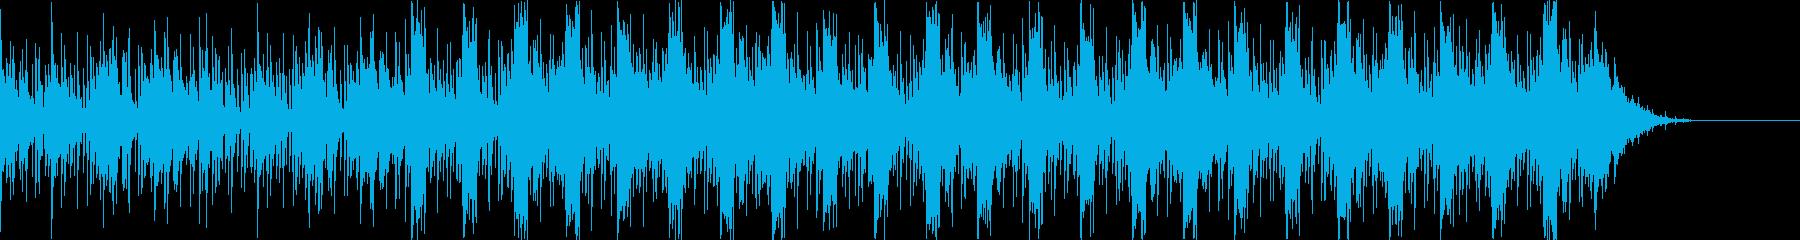 Pf「陰謀」和風現代ジャズの再生済みの波形